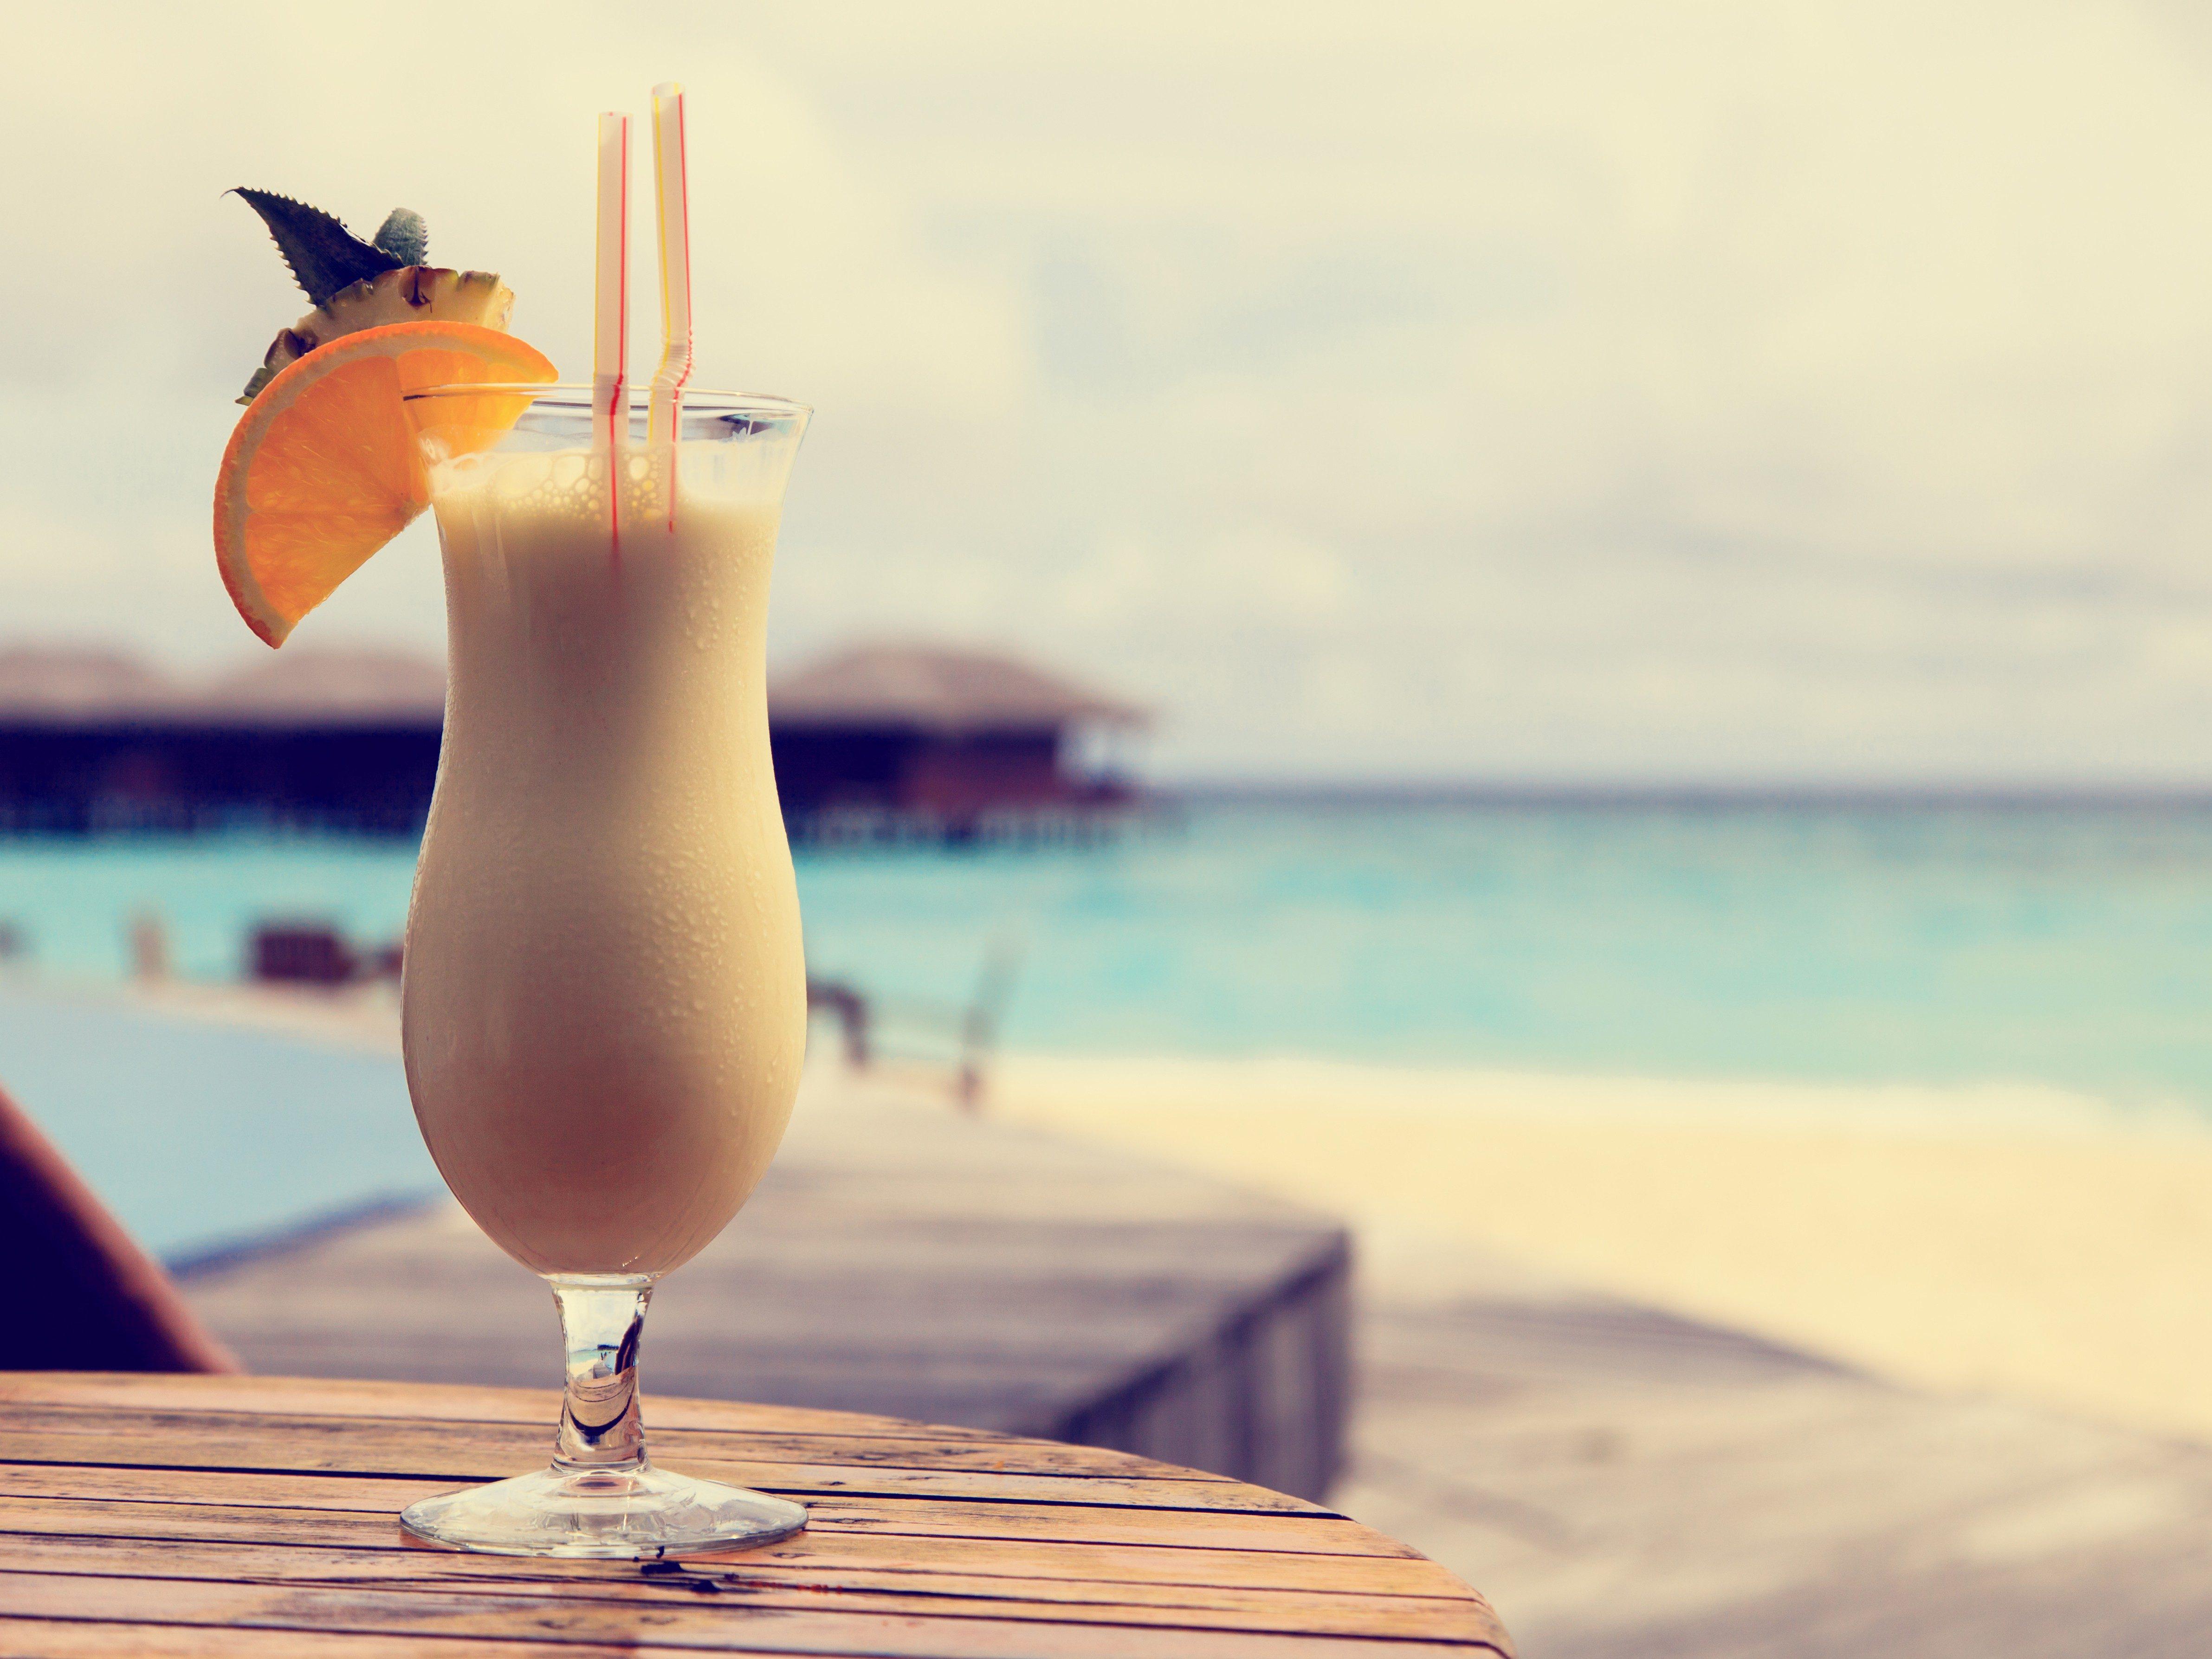 2. Avoid sugary drinks